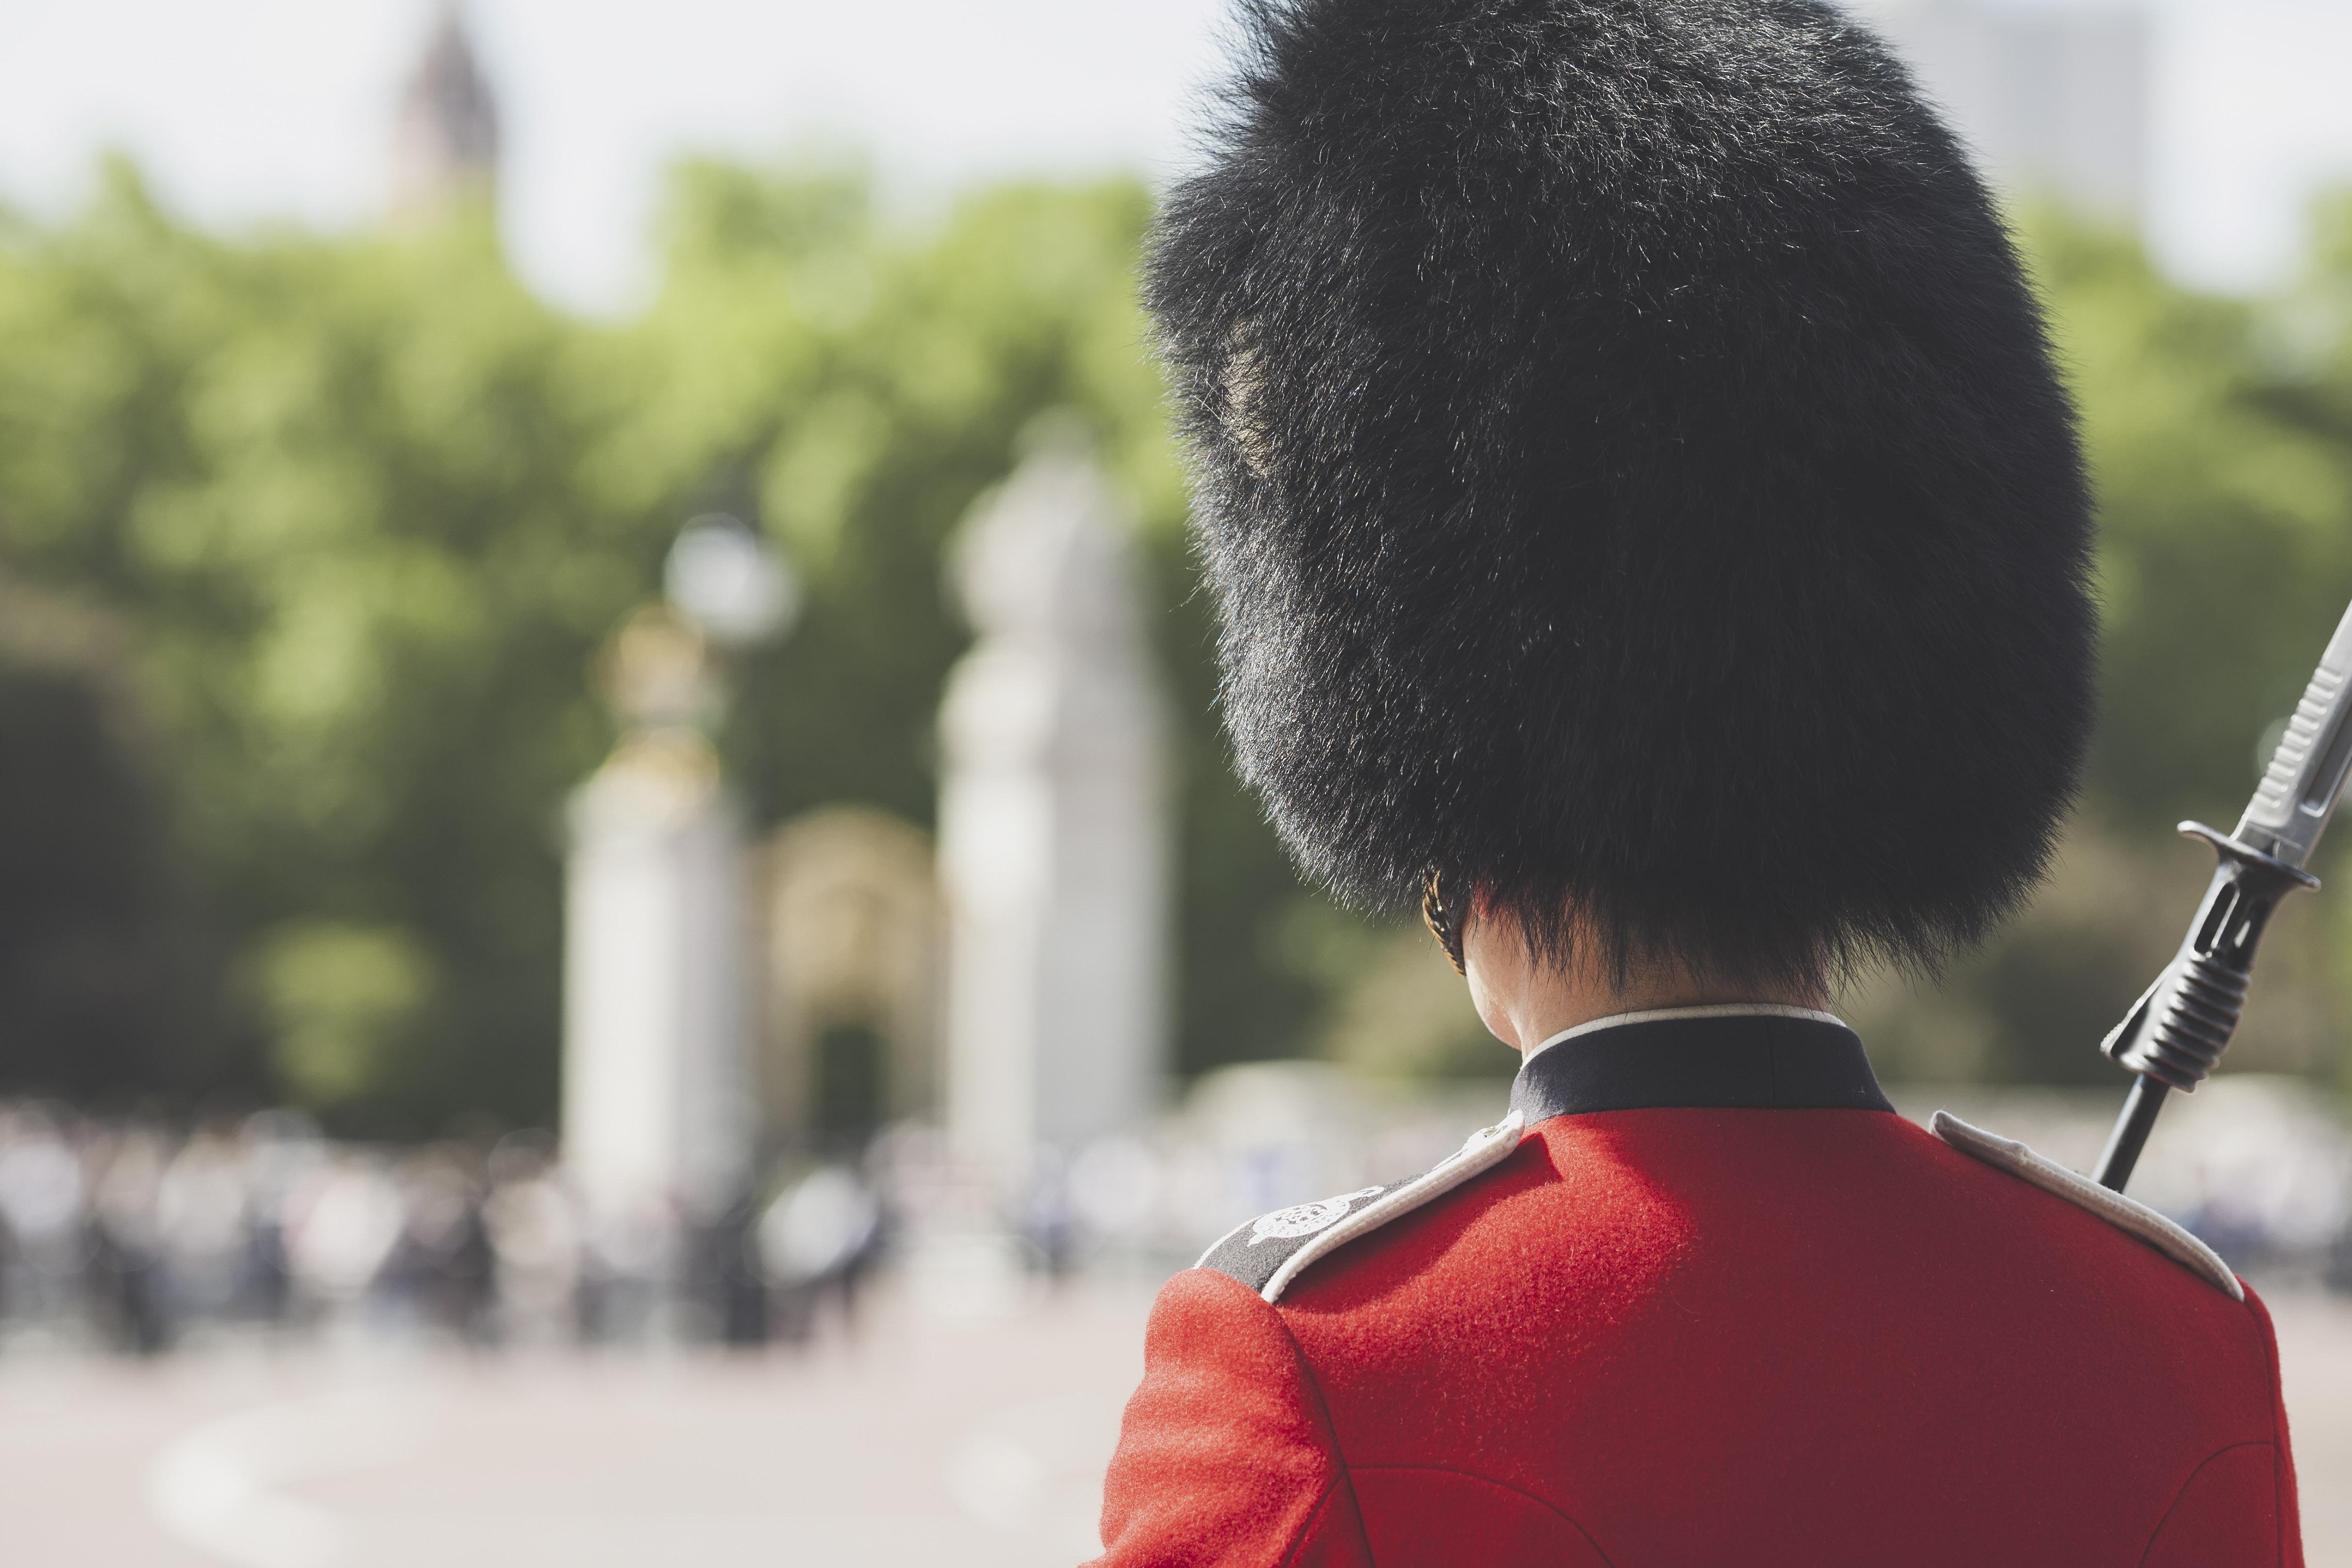 Royal wedding meghan markle Prince Harry 2019 Meghan's Royal Title Announcement